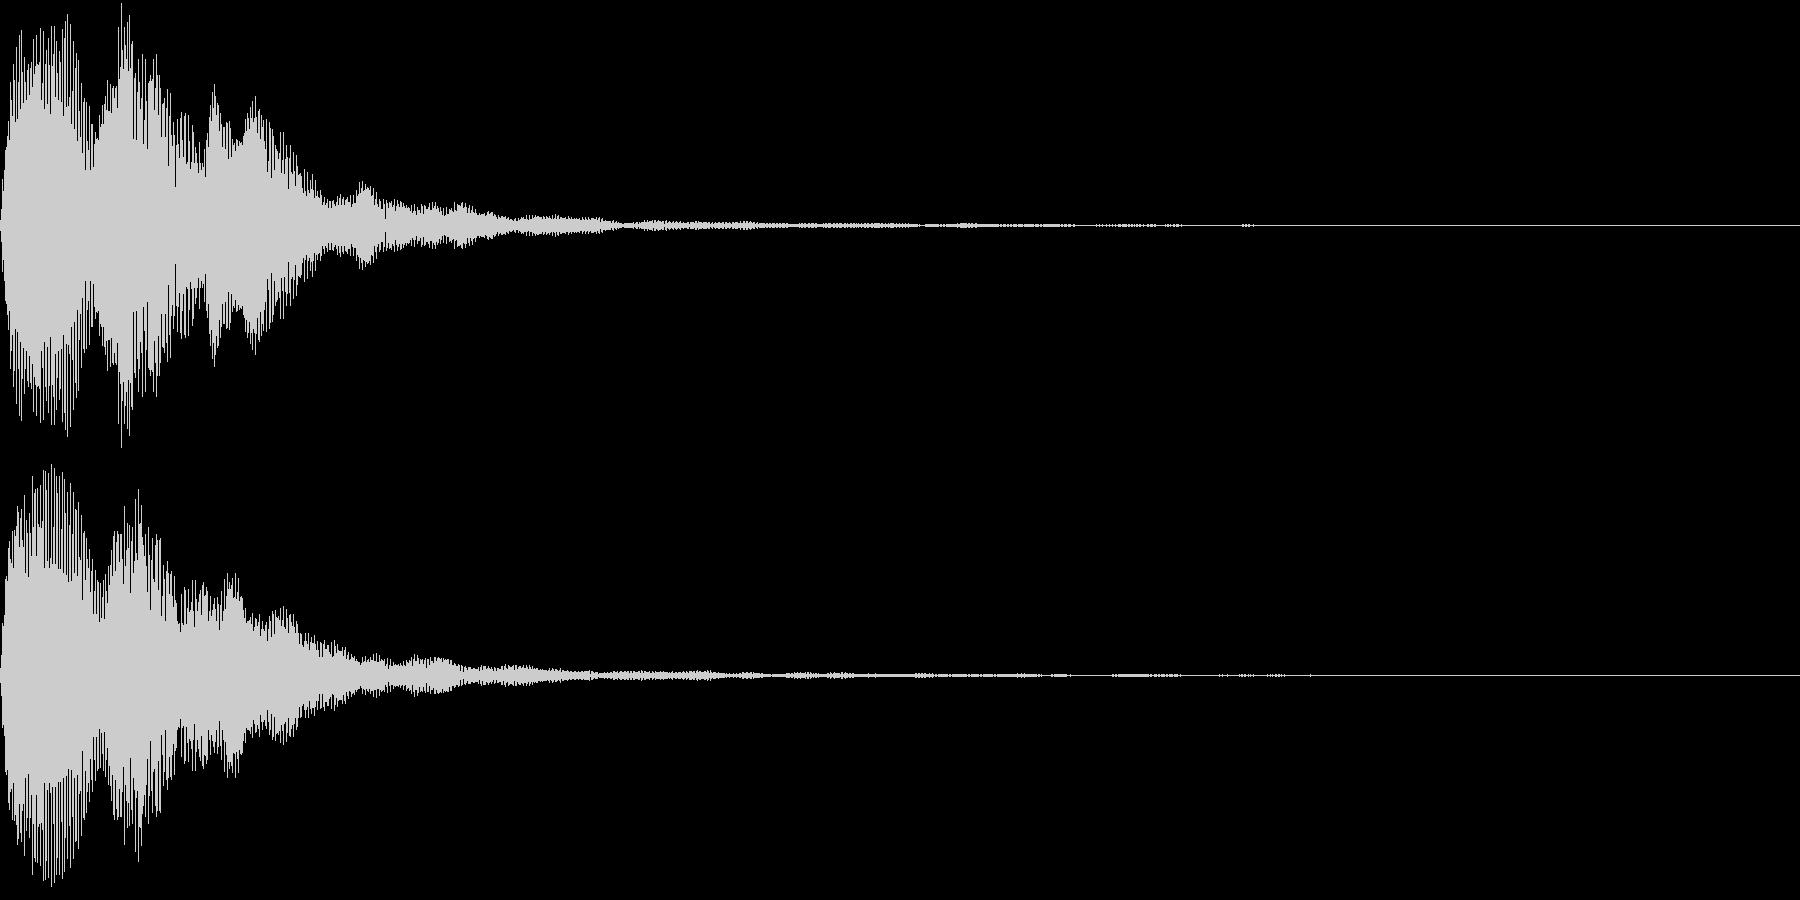 Digital PAY 決済音 決定音の未再生の波形